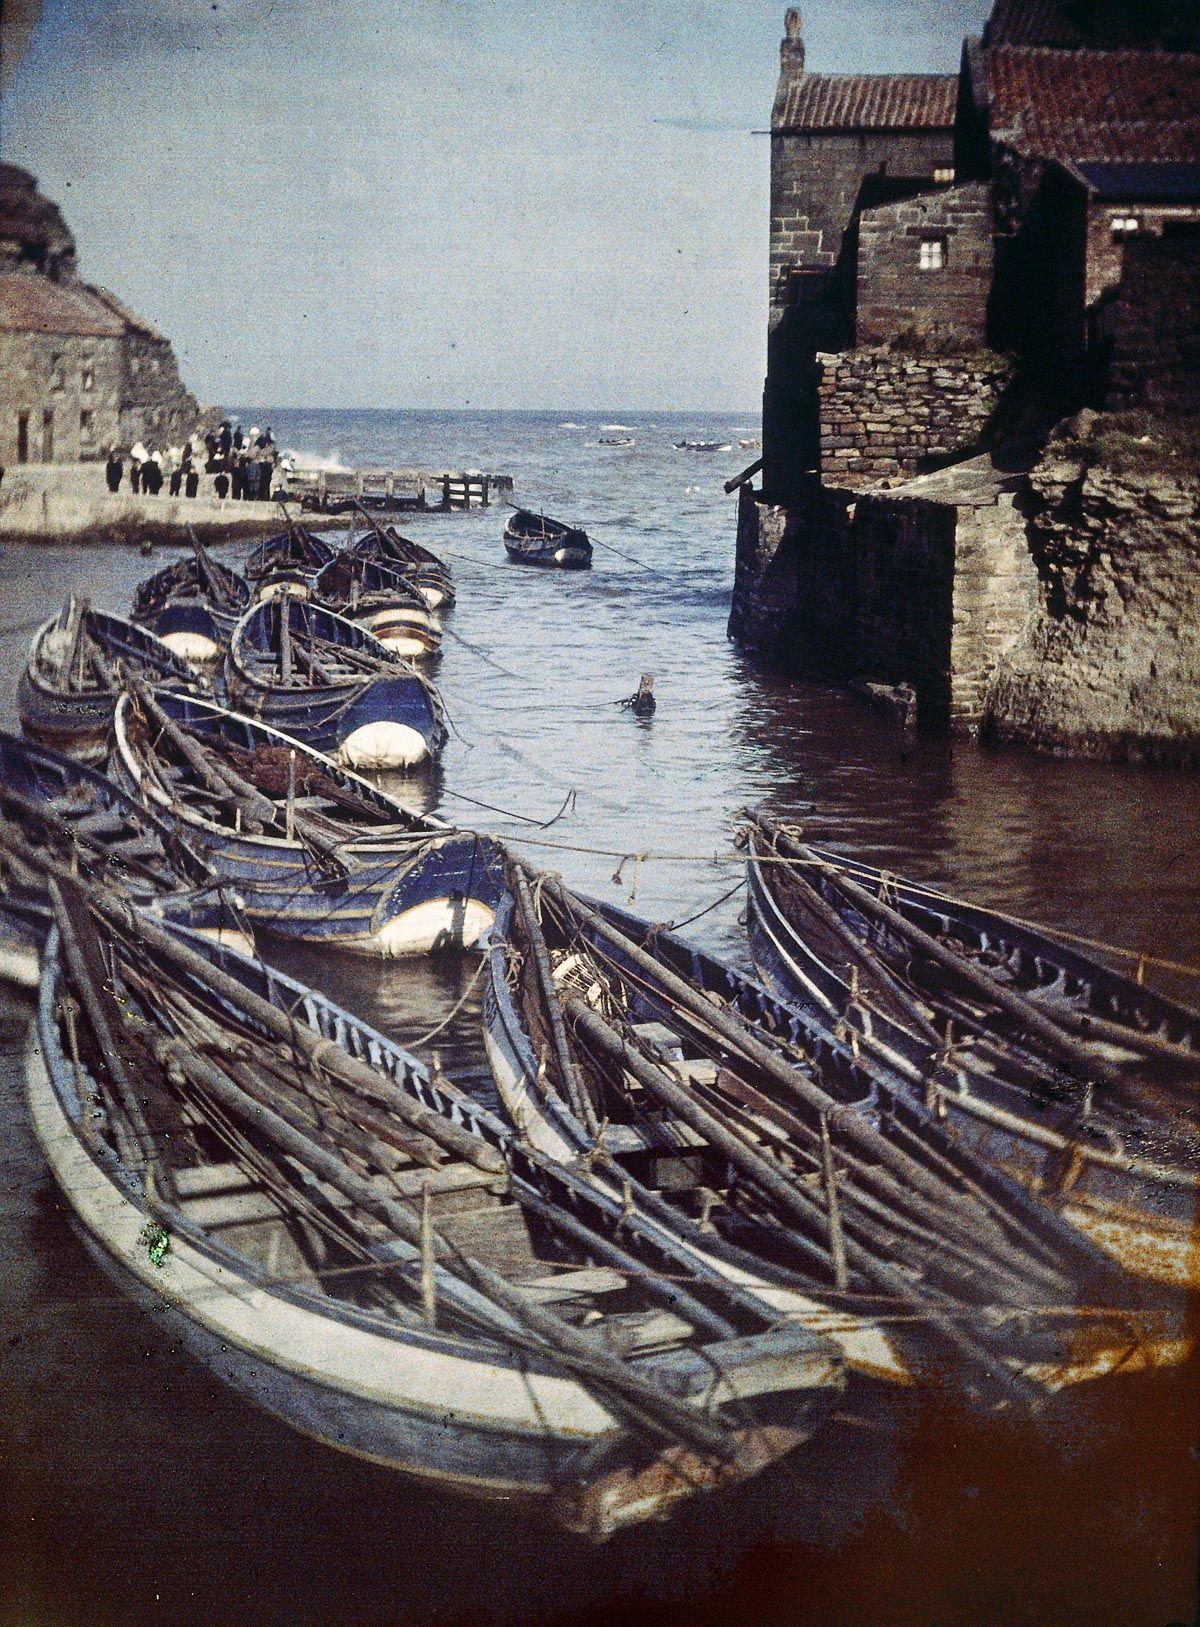 Staithes Harbour, 1915 (autochromes Bild) © John Cimon Warburg / Getty Images.